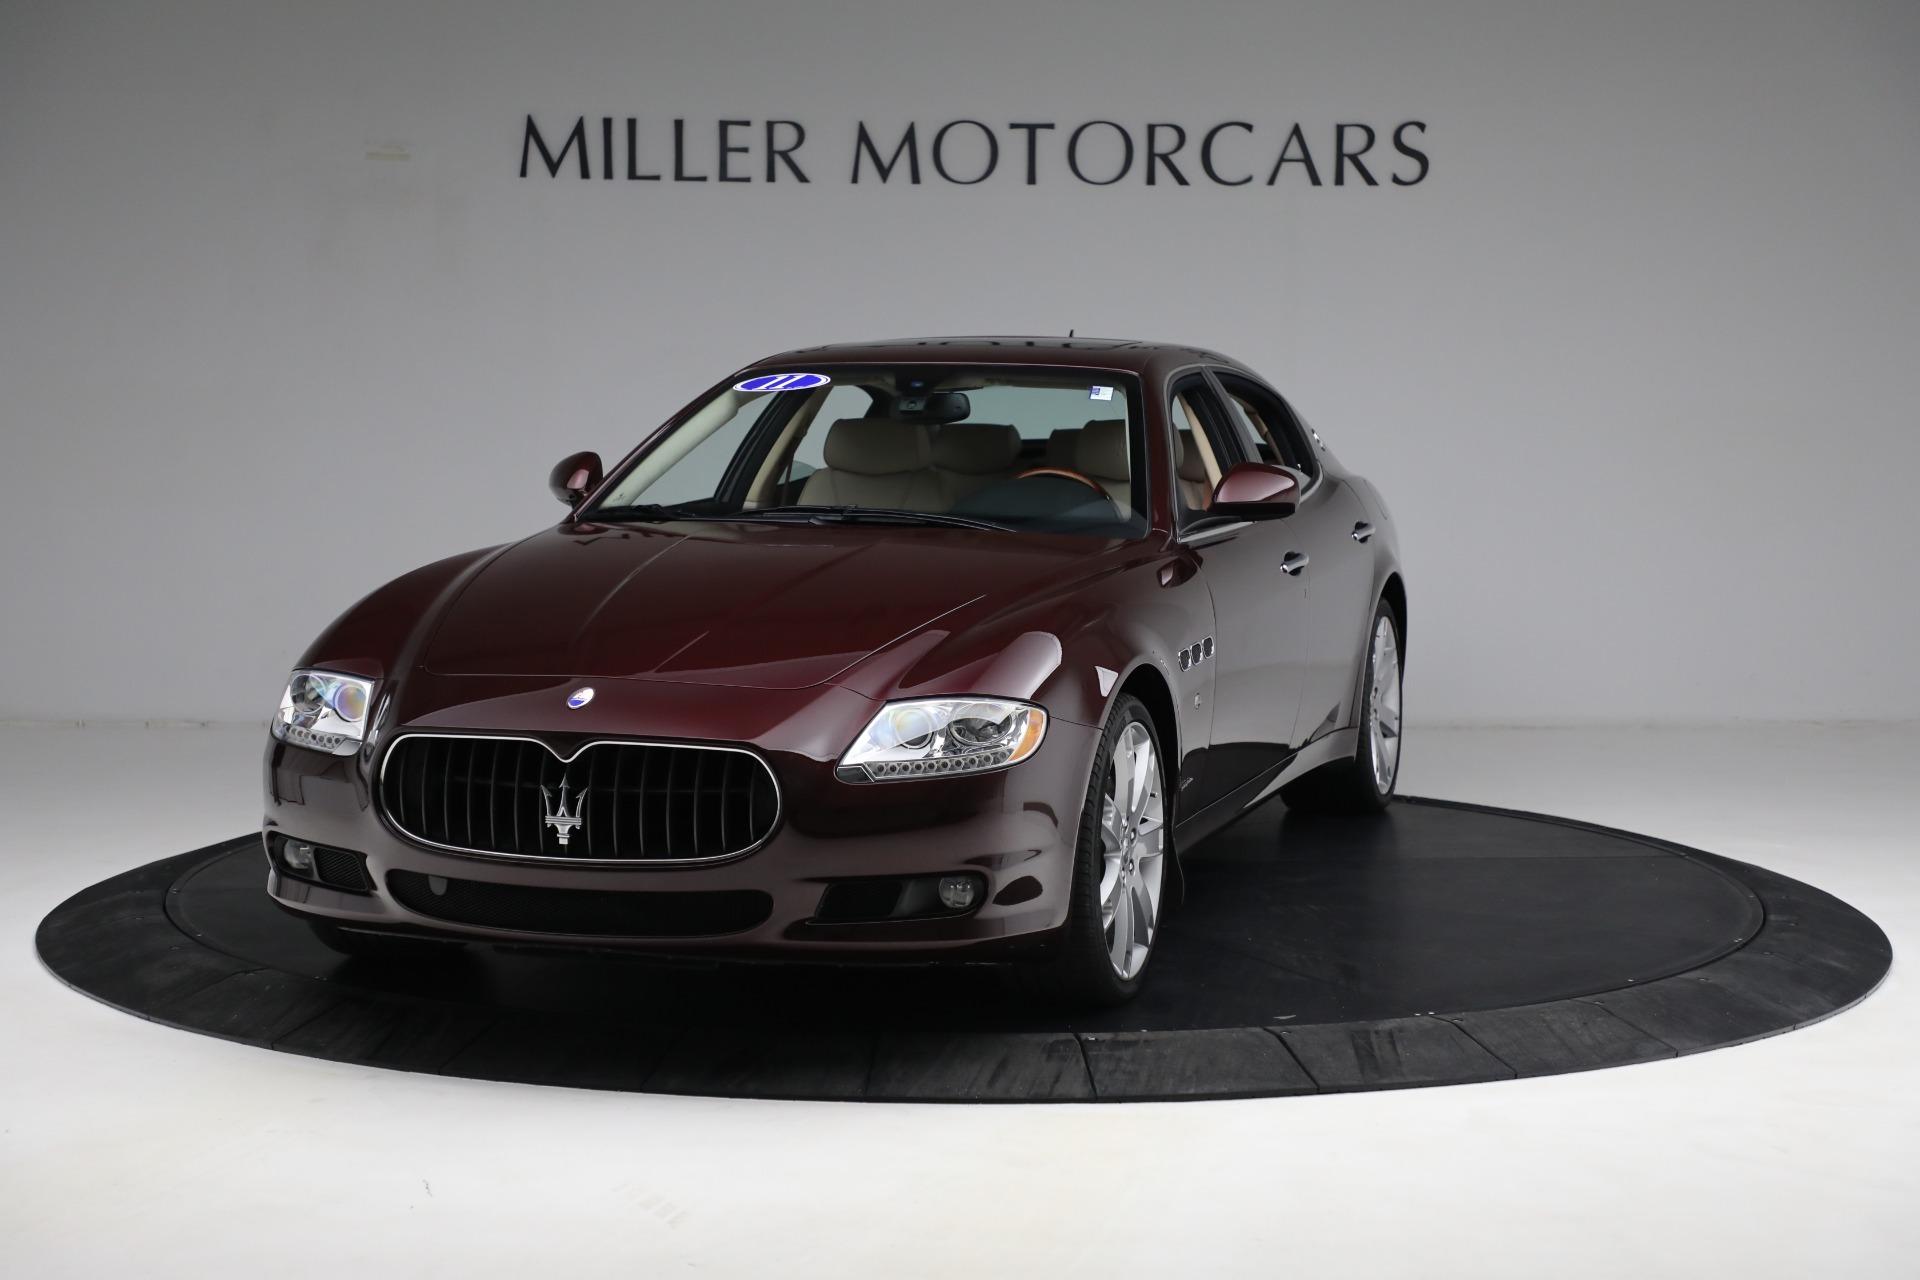 Used 2011 Maserati Quattroporte for sale $37,900 at Pagani of Greenwich in Greenwich CT 06830 1